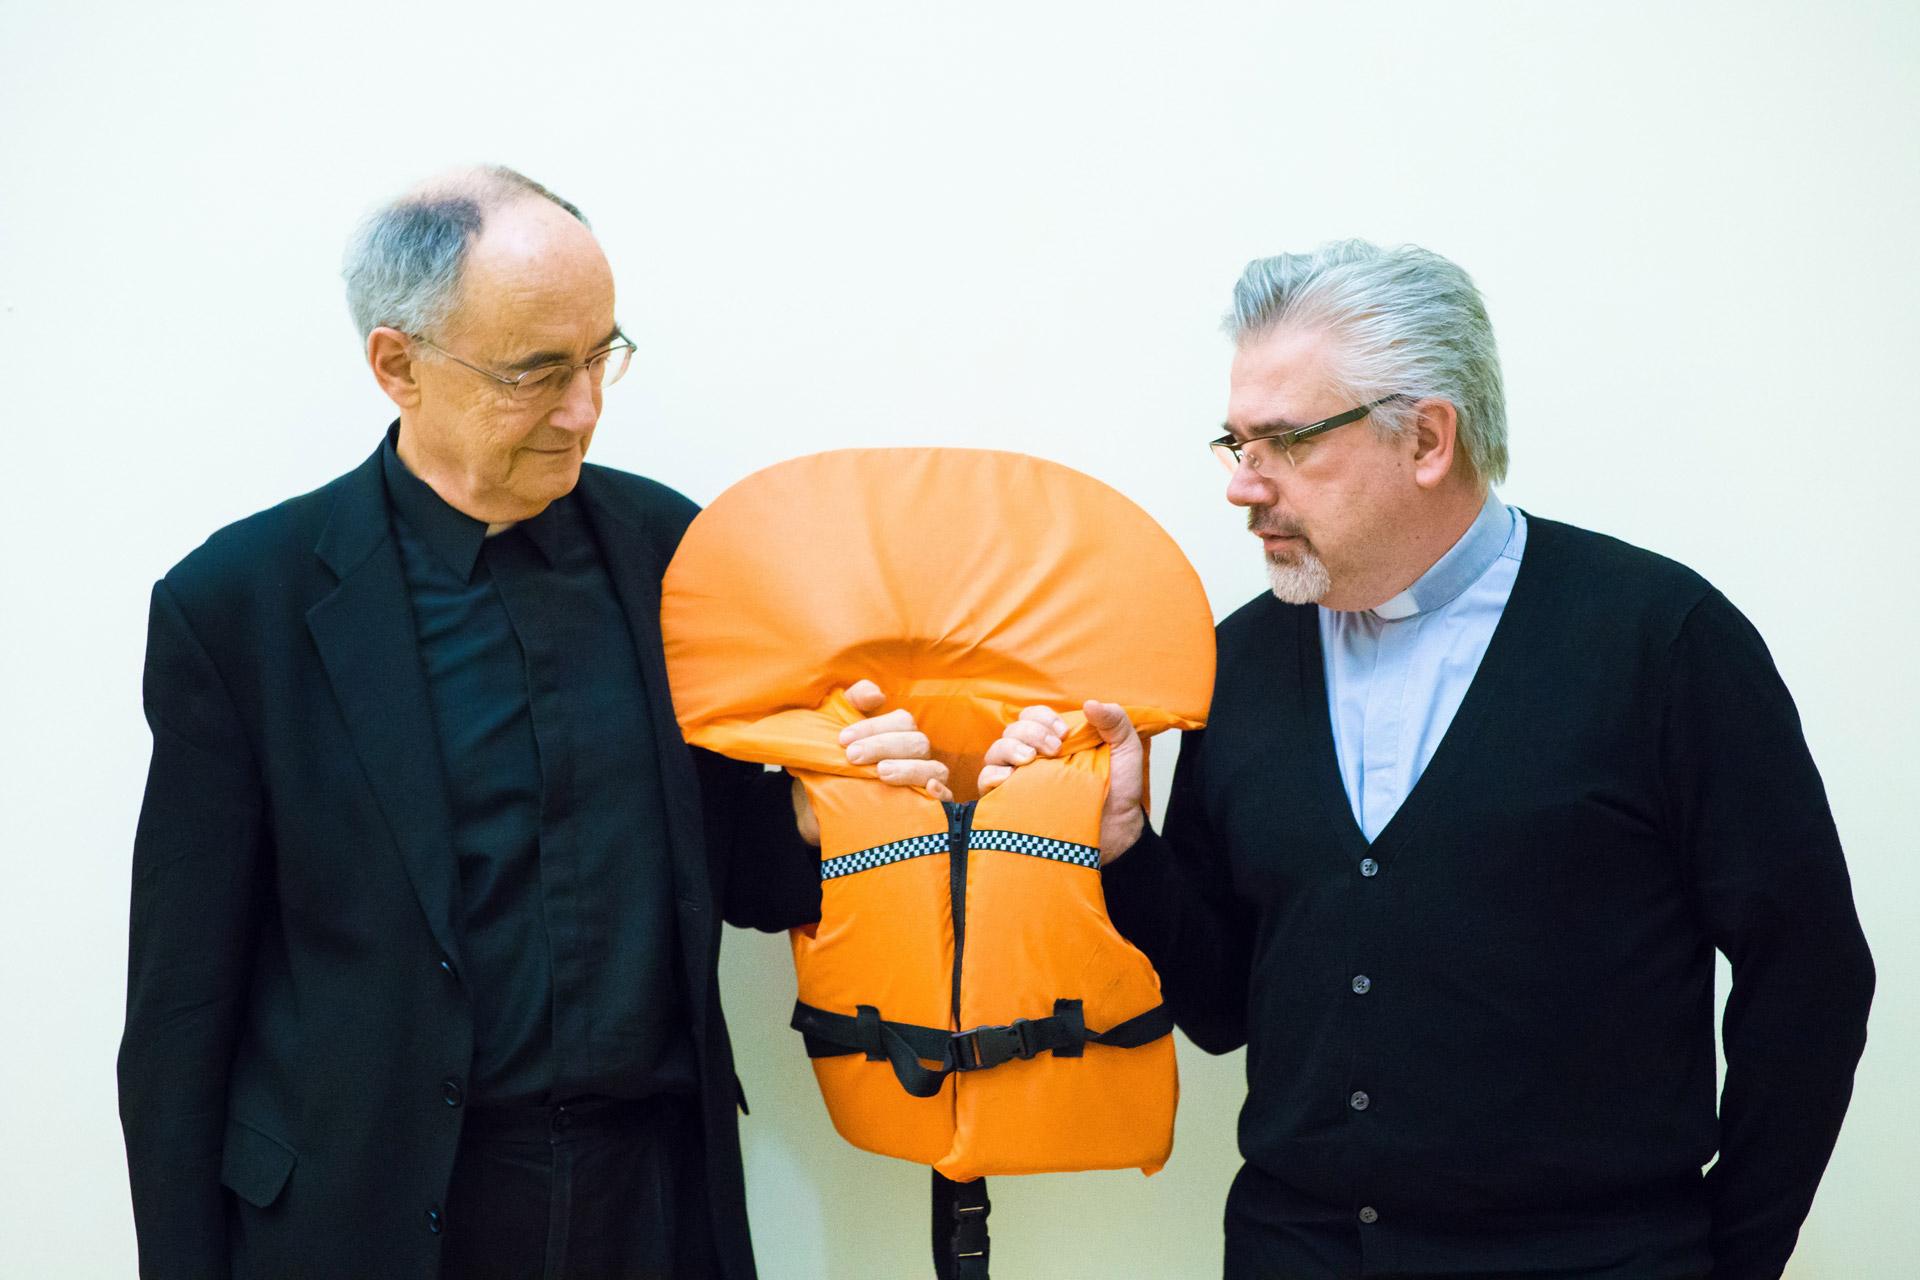 Migrants & Refugees Section - Fr. Michael Czerny, SJ & Fr. Baggio